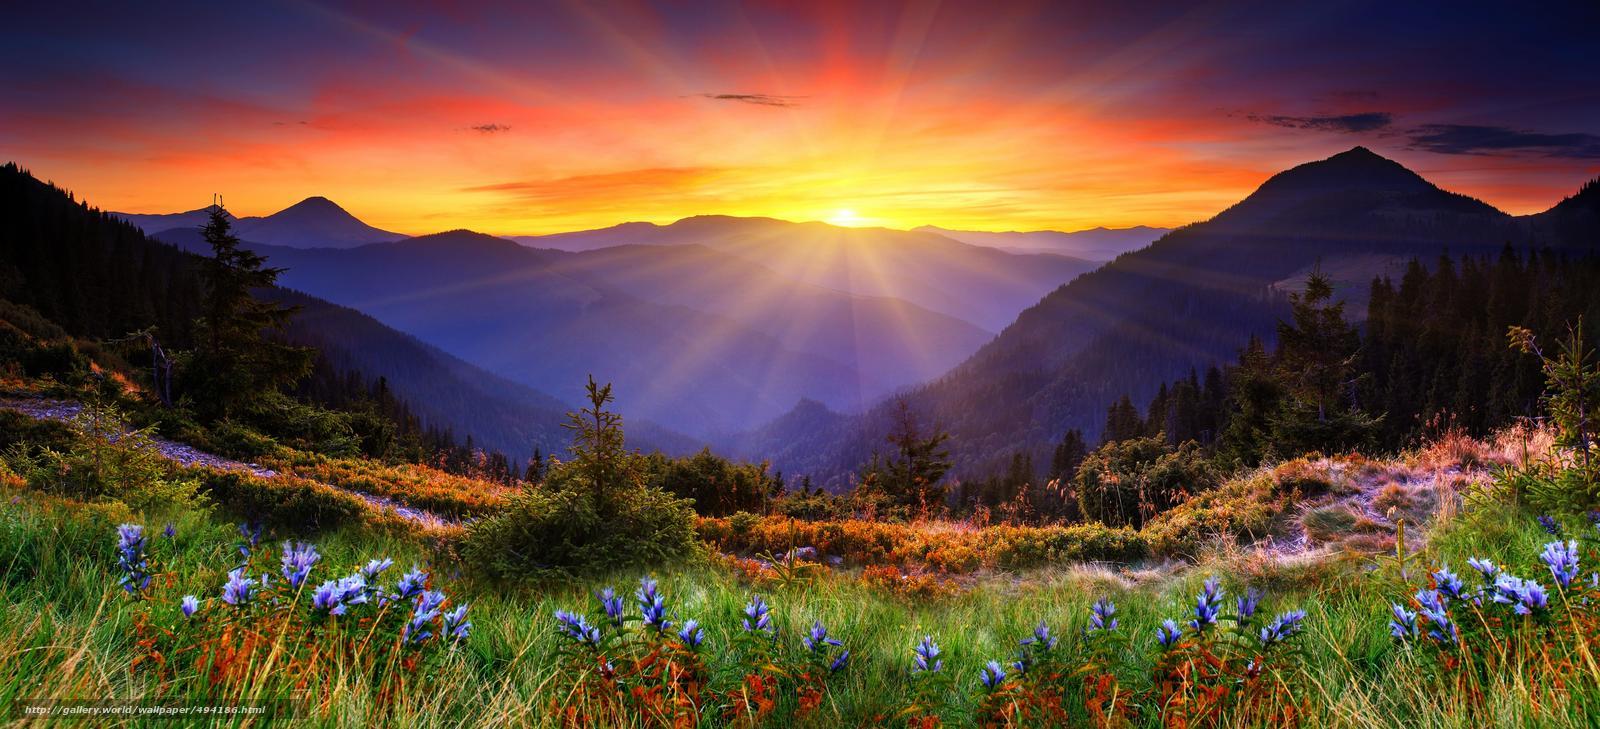 Rolland Asley: Free Landscape Pics Downloads